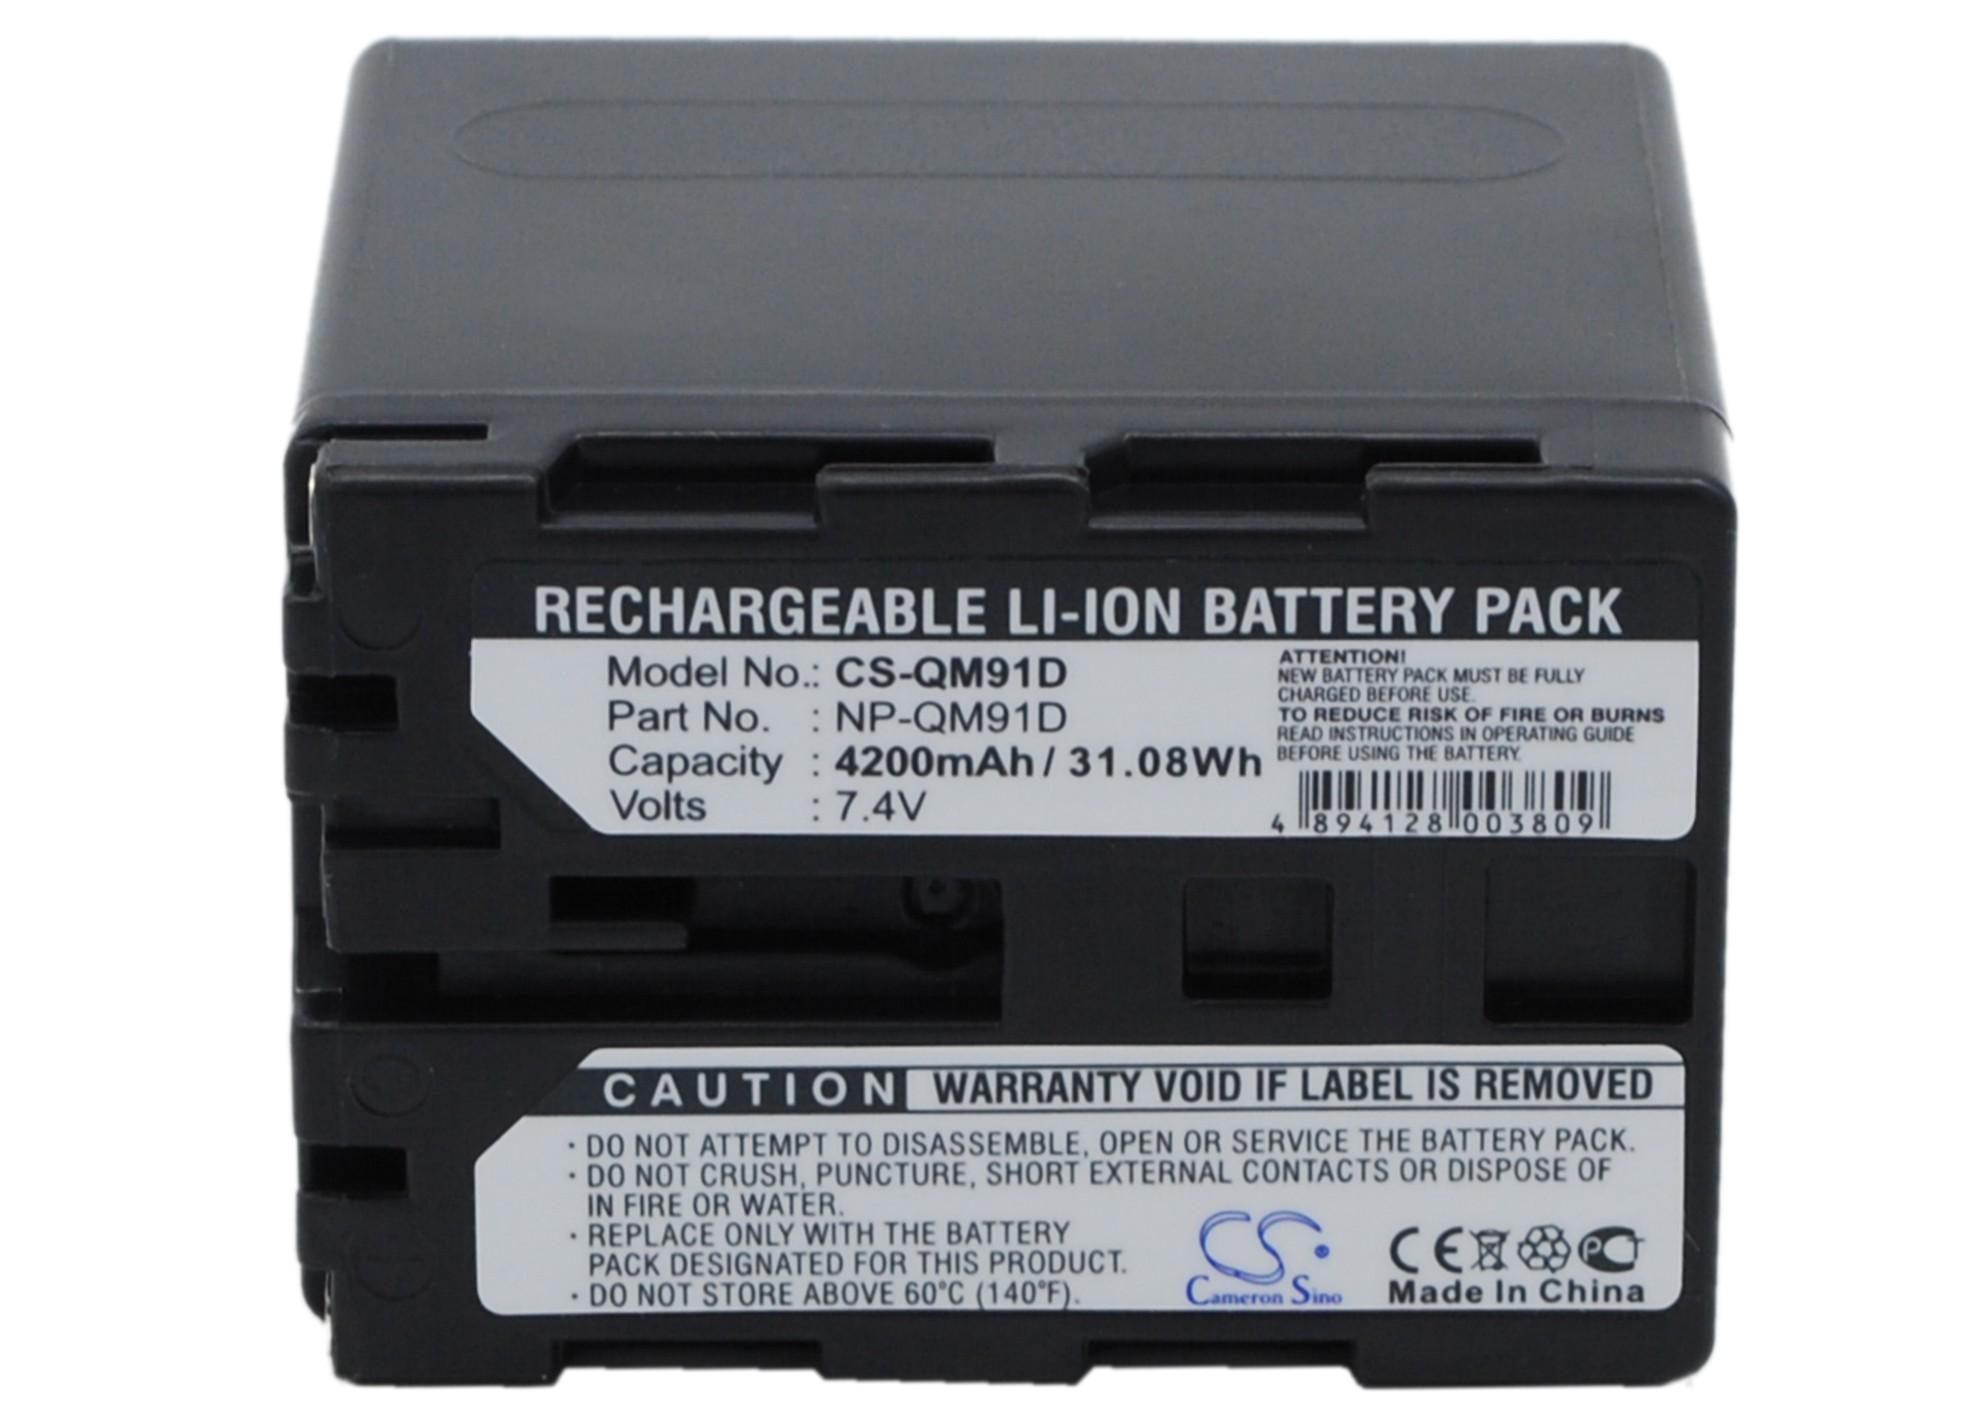 Cameron Sino baterie do kamer a fotoaparátů pro SONY DCR-TRV16 7.4V Li-ion 4200mAh tmavě šedá - neoriginální